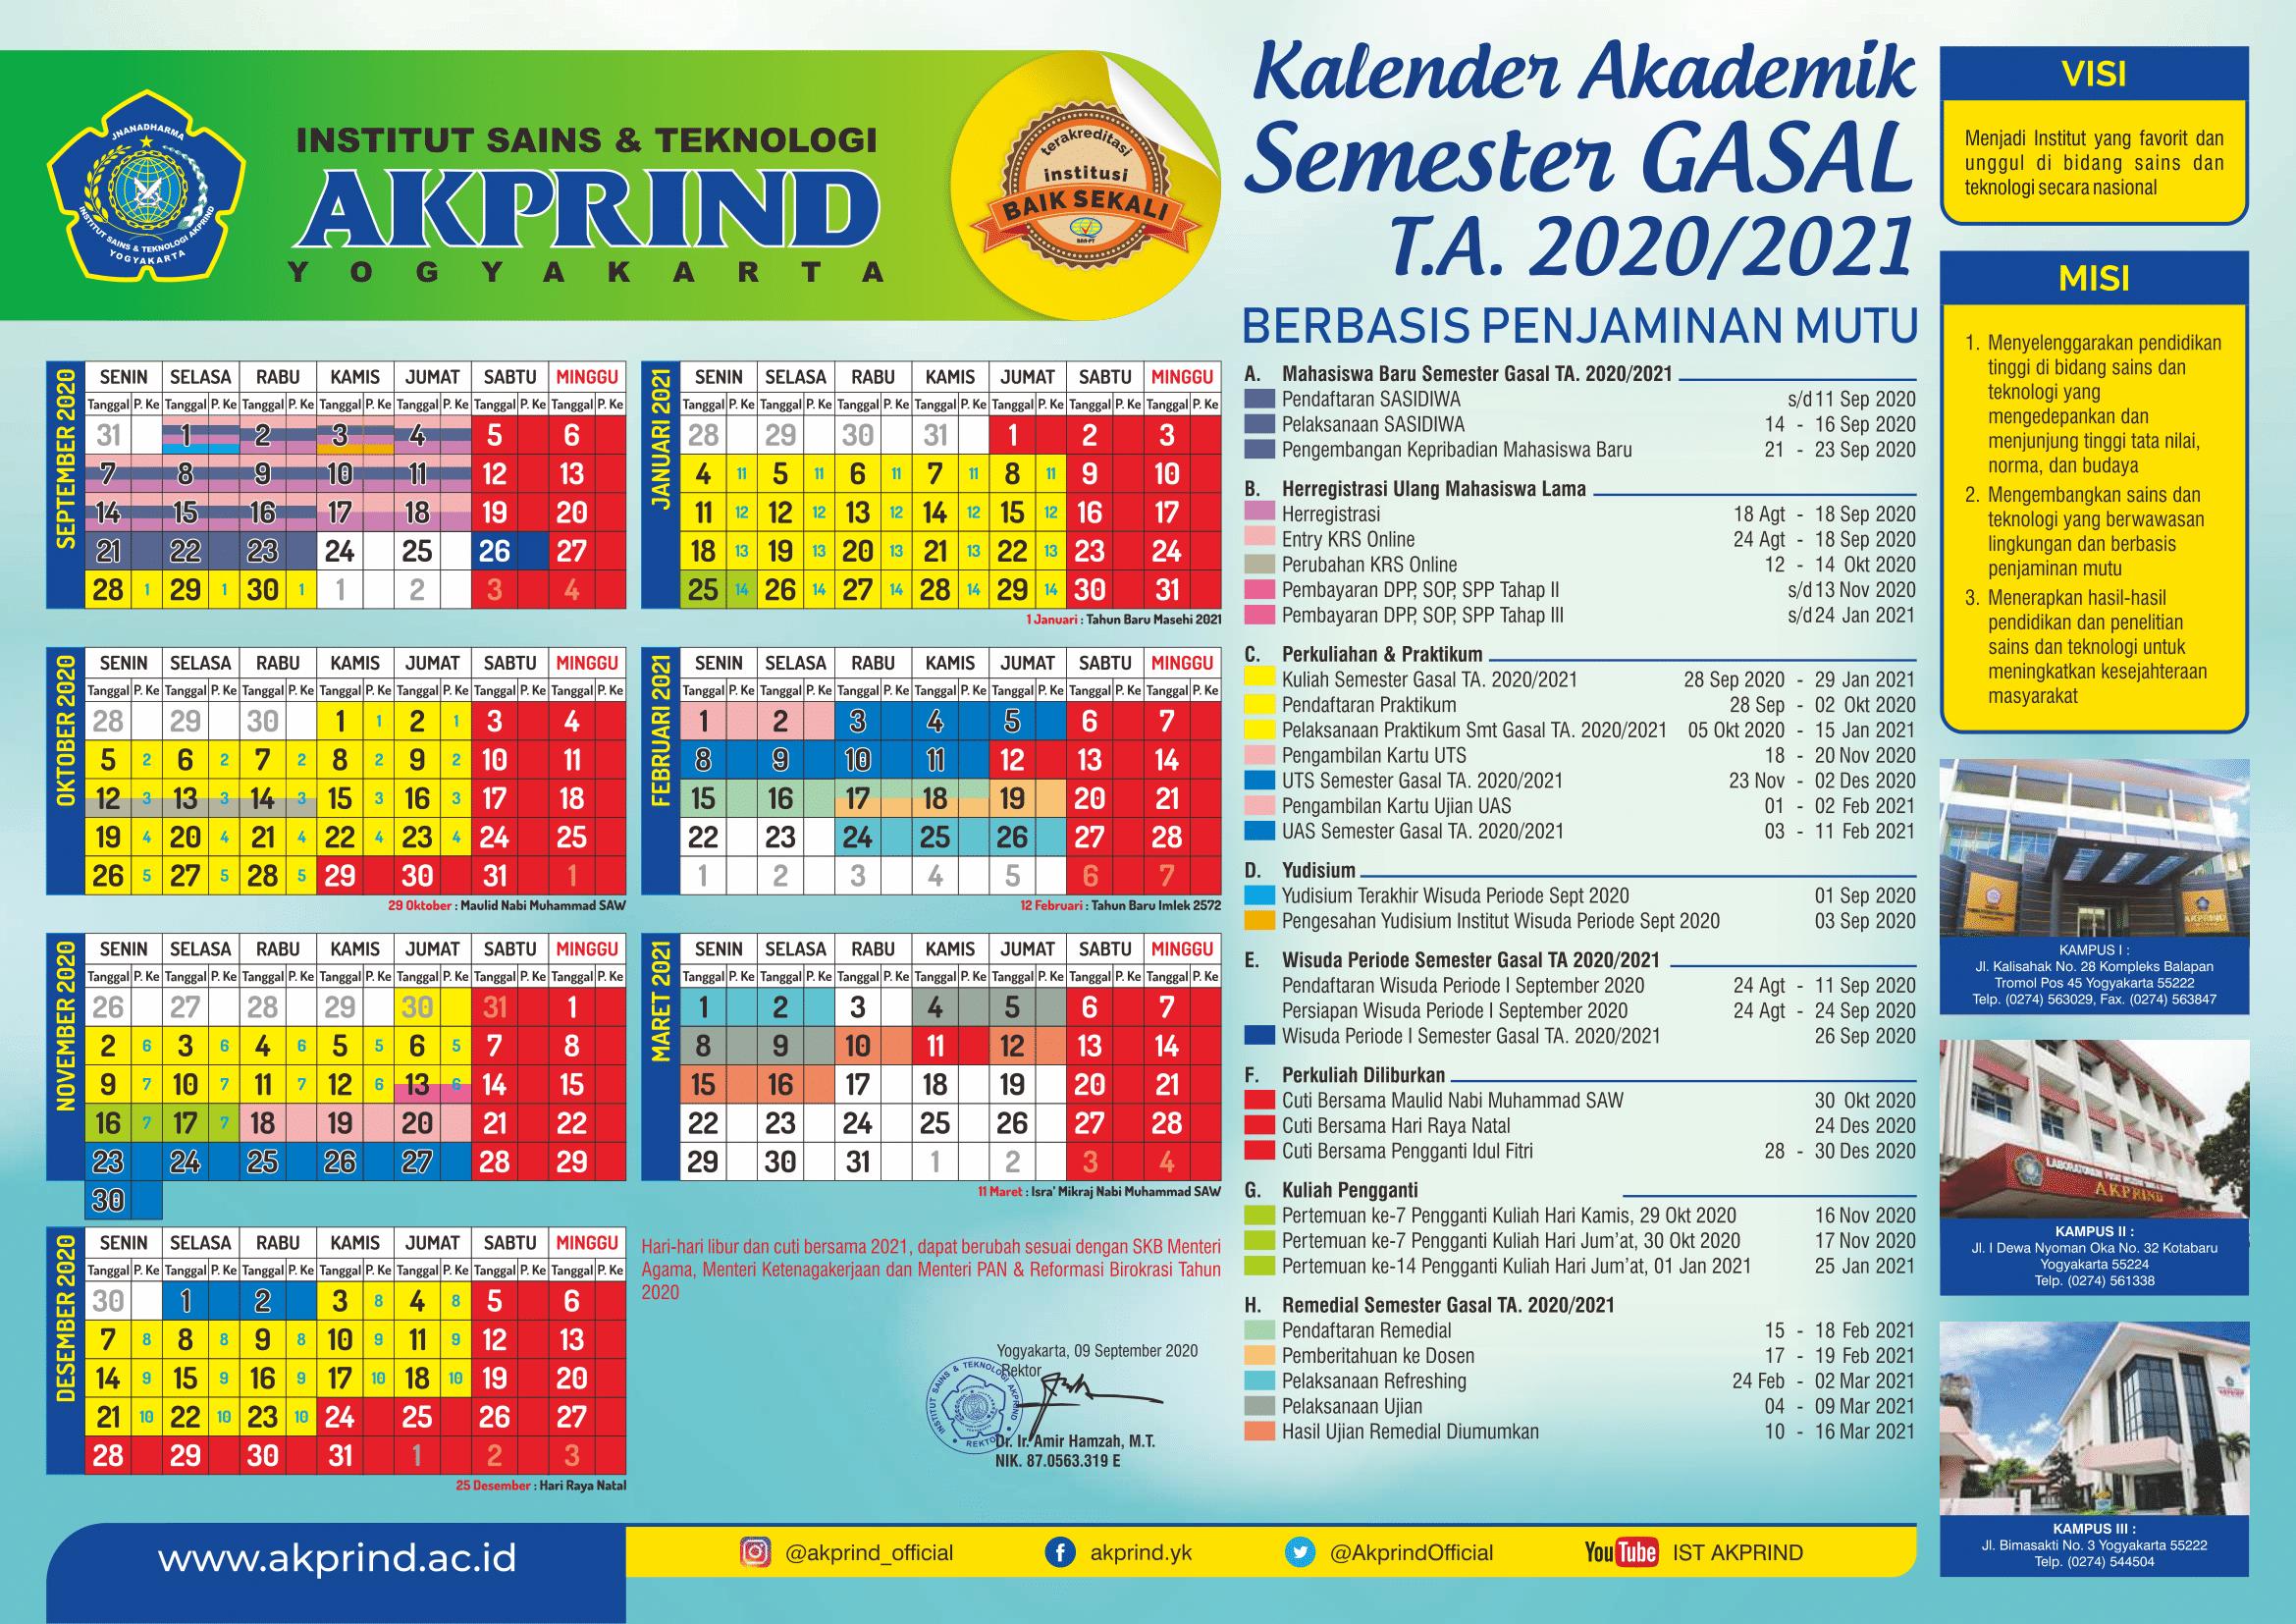 Kalender Akademik Unnes 2020 2021